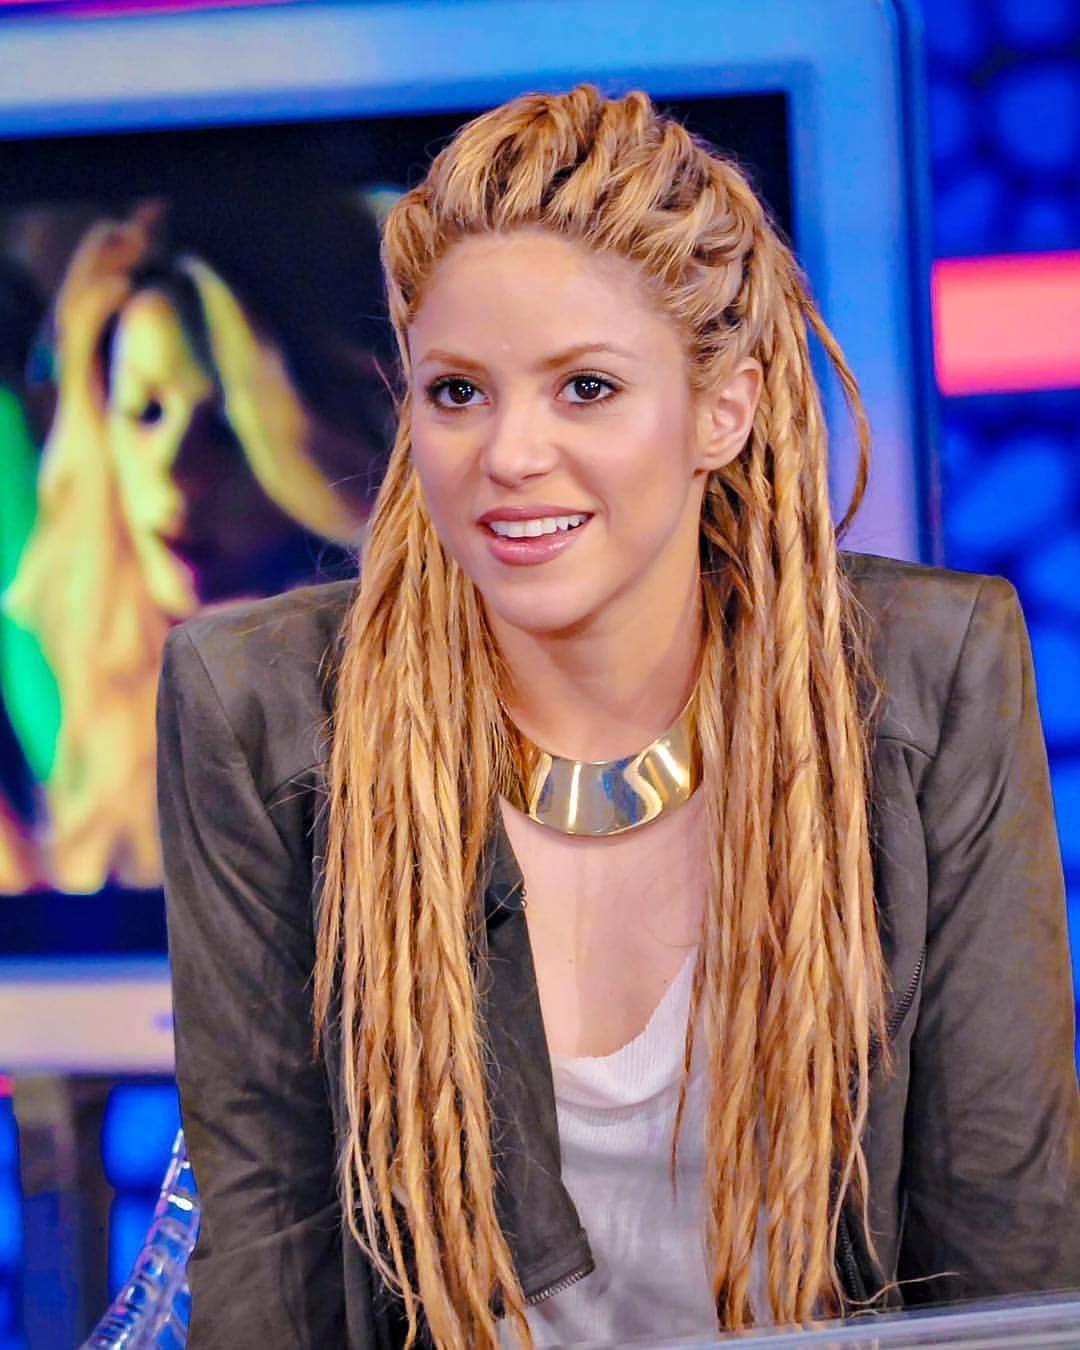 Pin By Rhea Roy On Shakira Hair In 2020 Shakira Hair Hair Styles